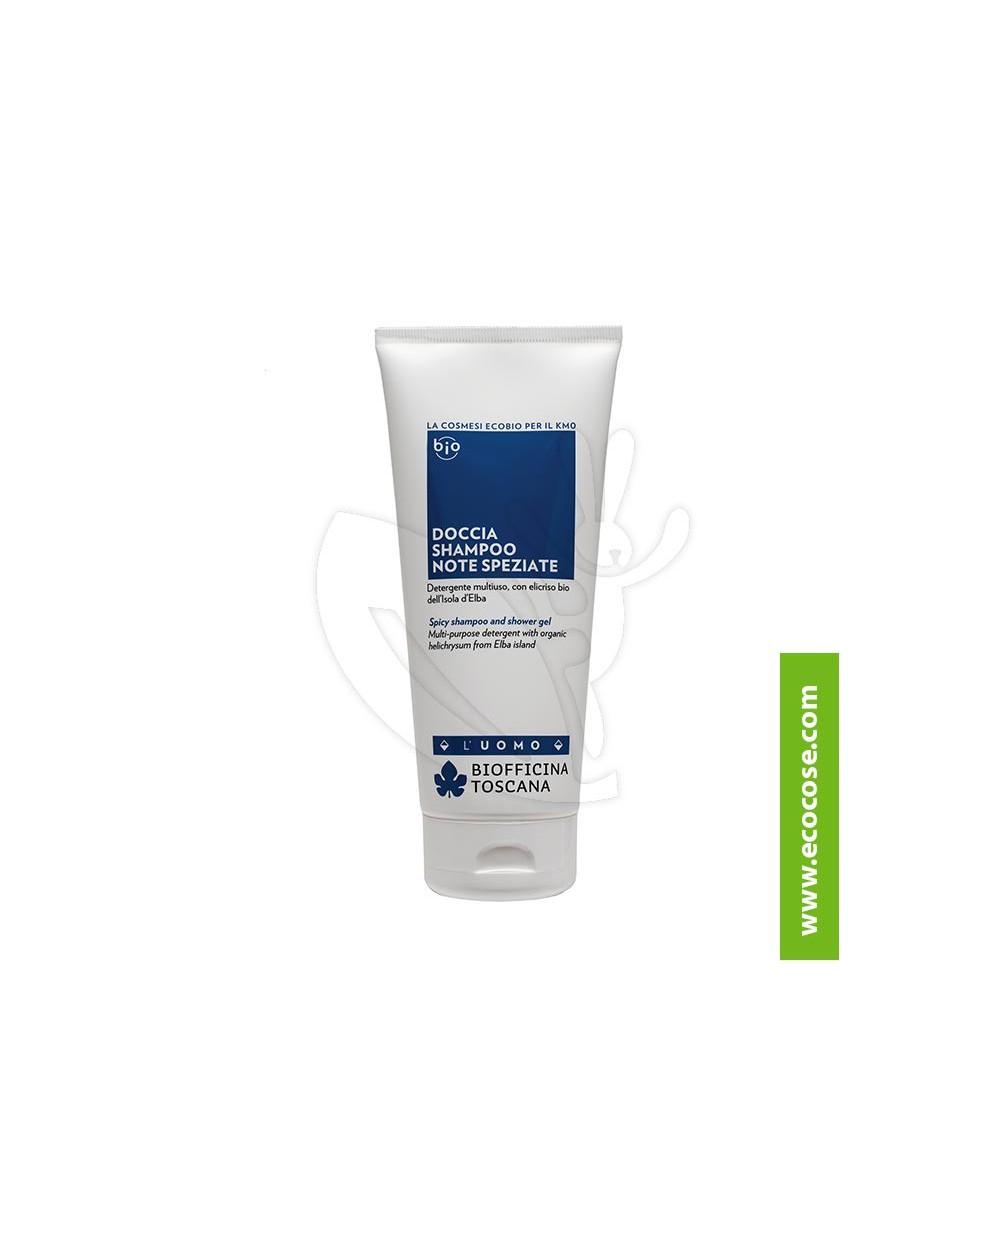 Biofficina Toscana - UOMO - Doccia shampoo Note SPEZIATE